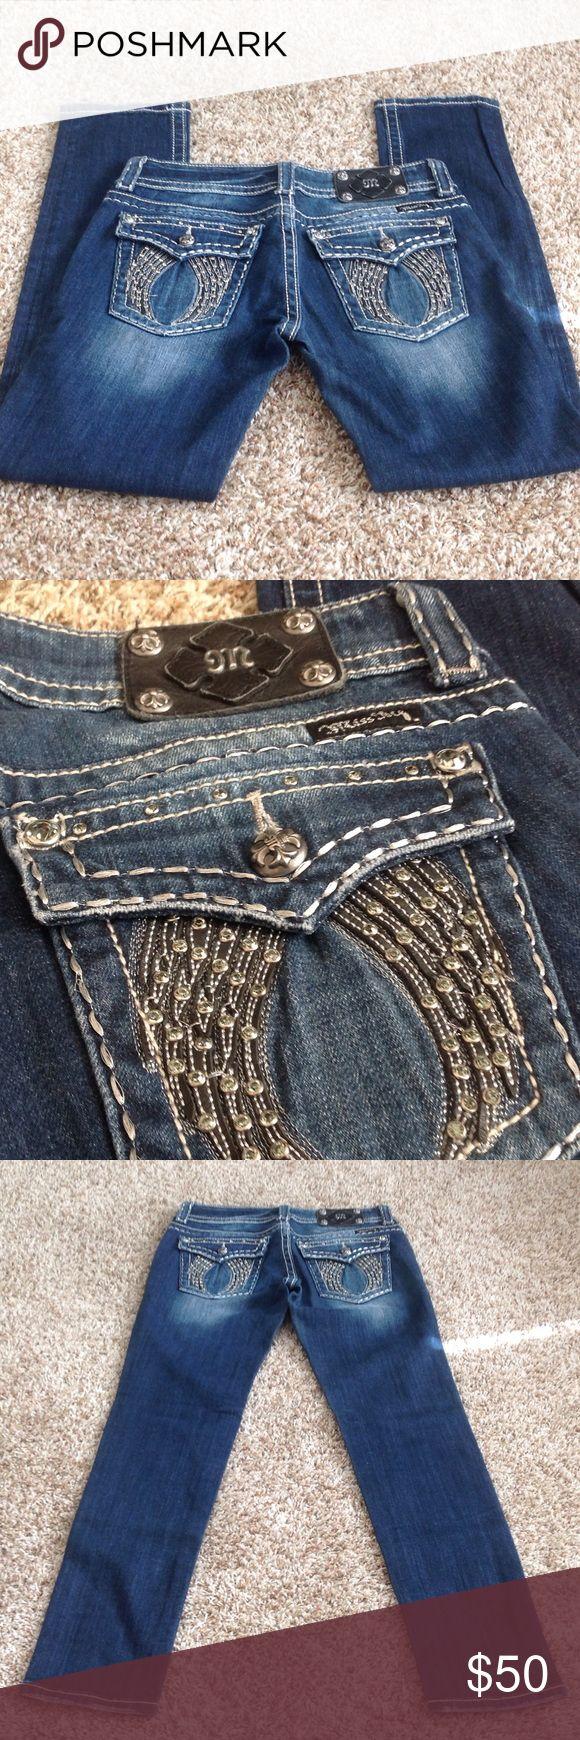 Miss Me Skinny jeans Miss Me Skinny jeans, size 28, wing embellishments on back pockets. Miss Me Jeans Skinny